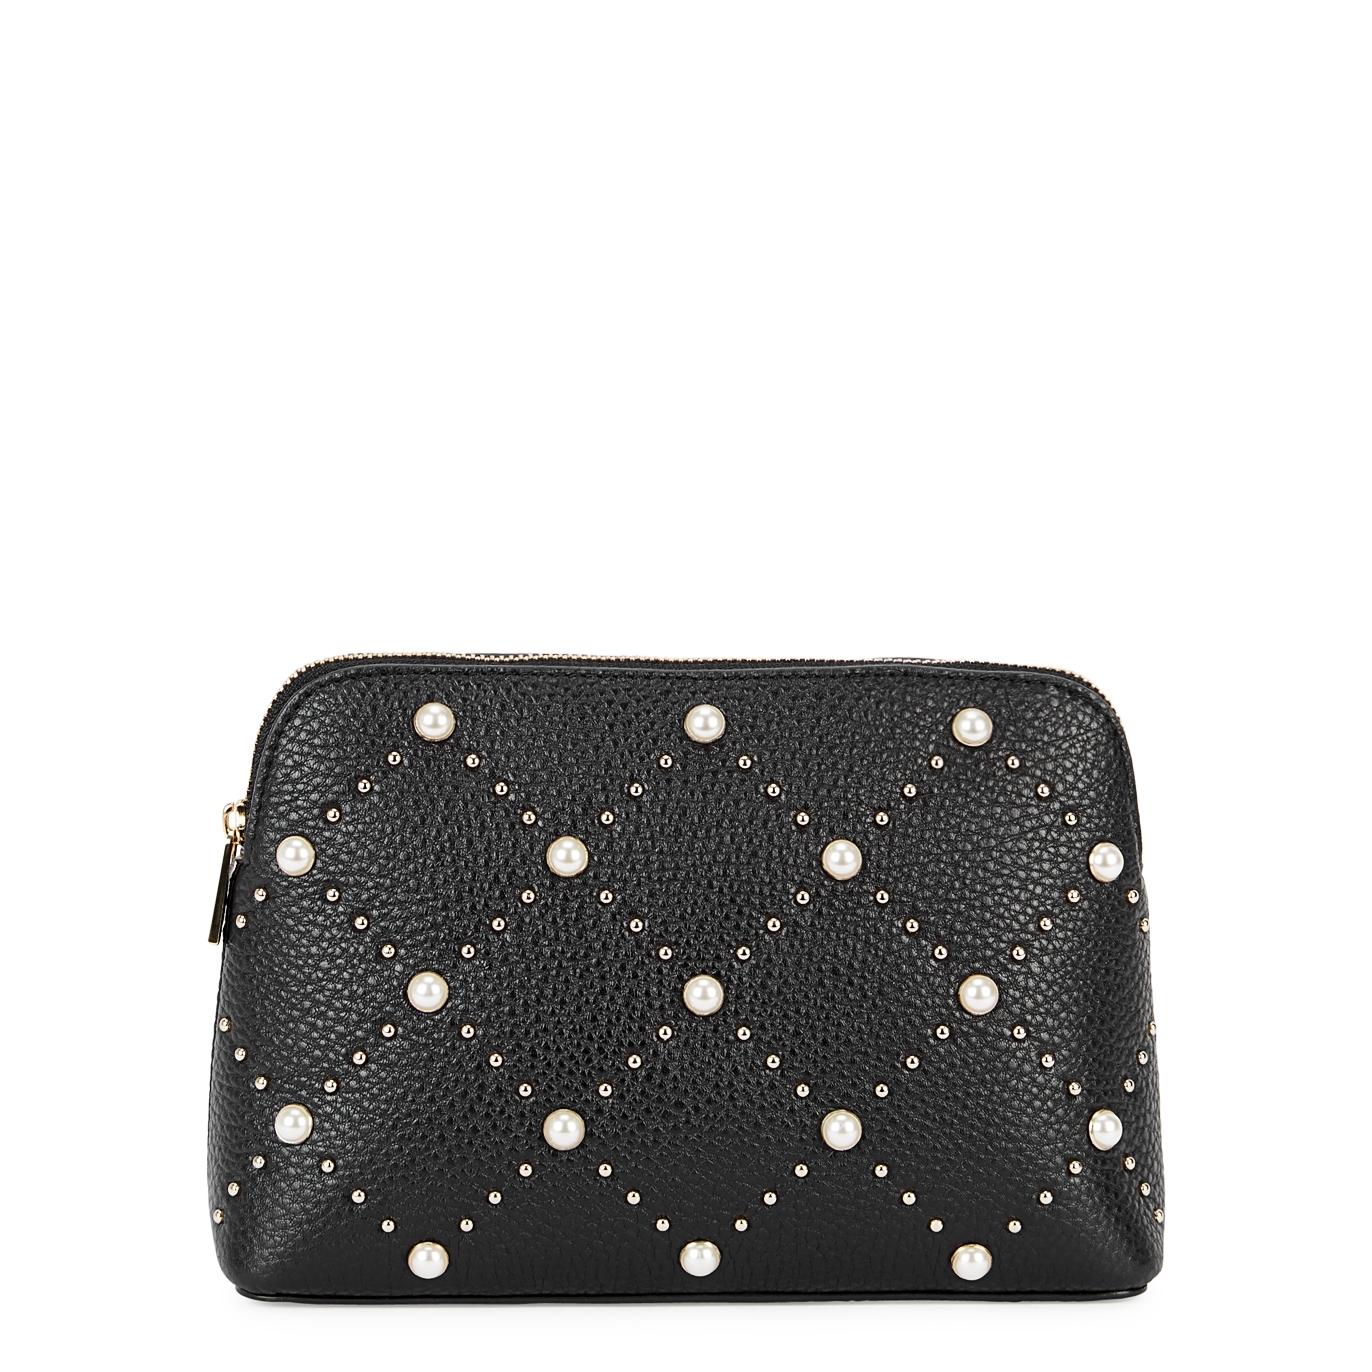 b7c8c22c46c6 Kate Spade New York Hayes Briley small leather makeup bag - Harvey Nichols